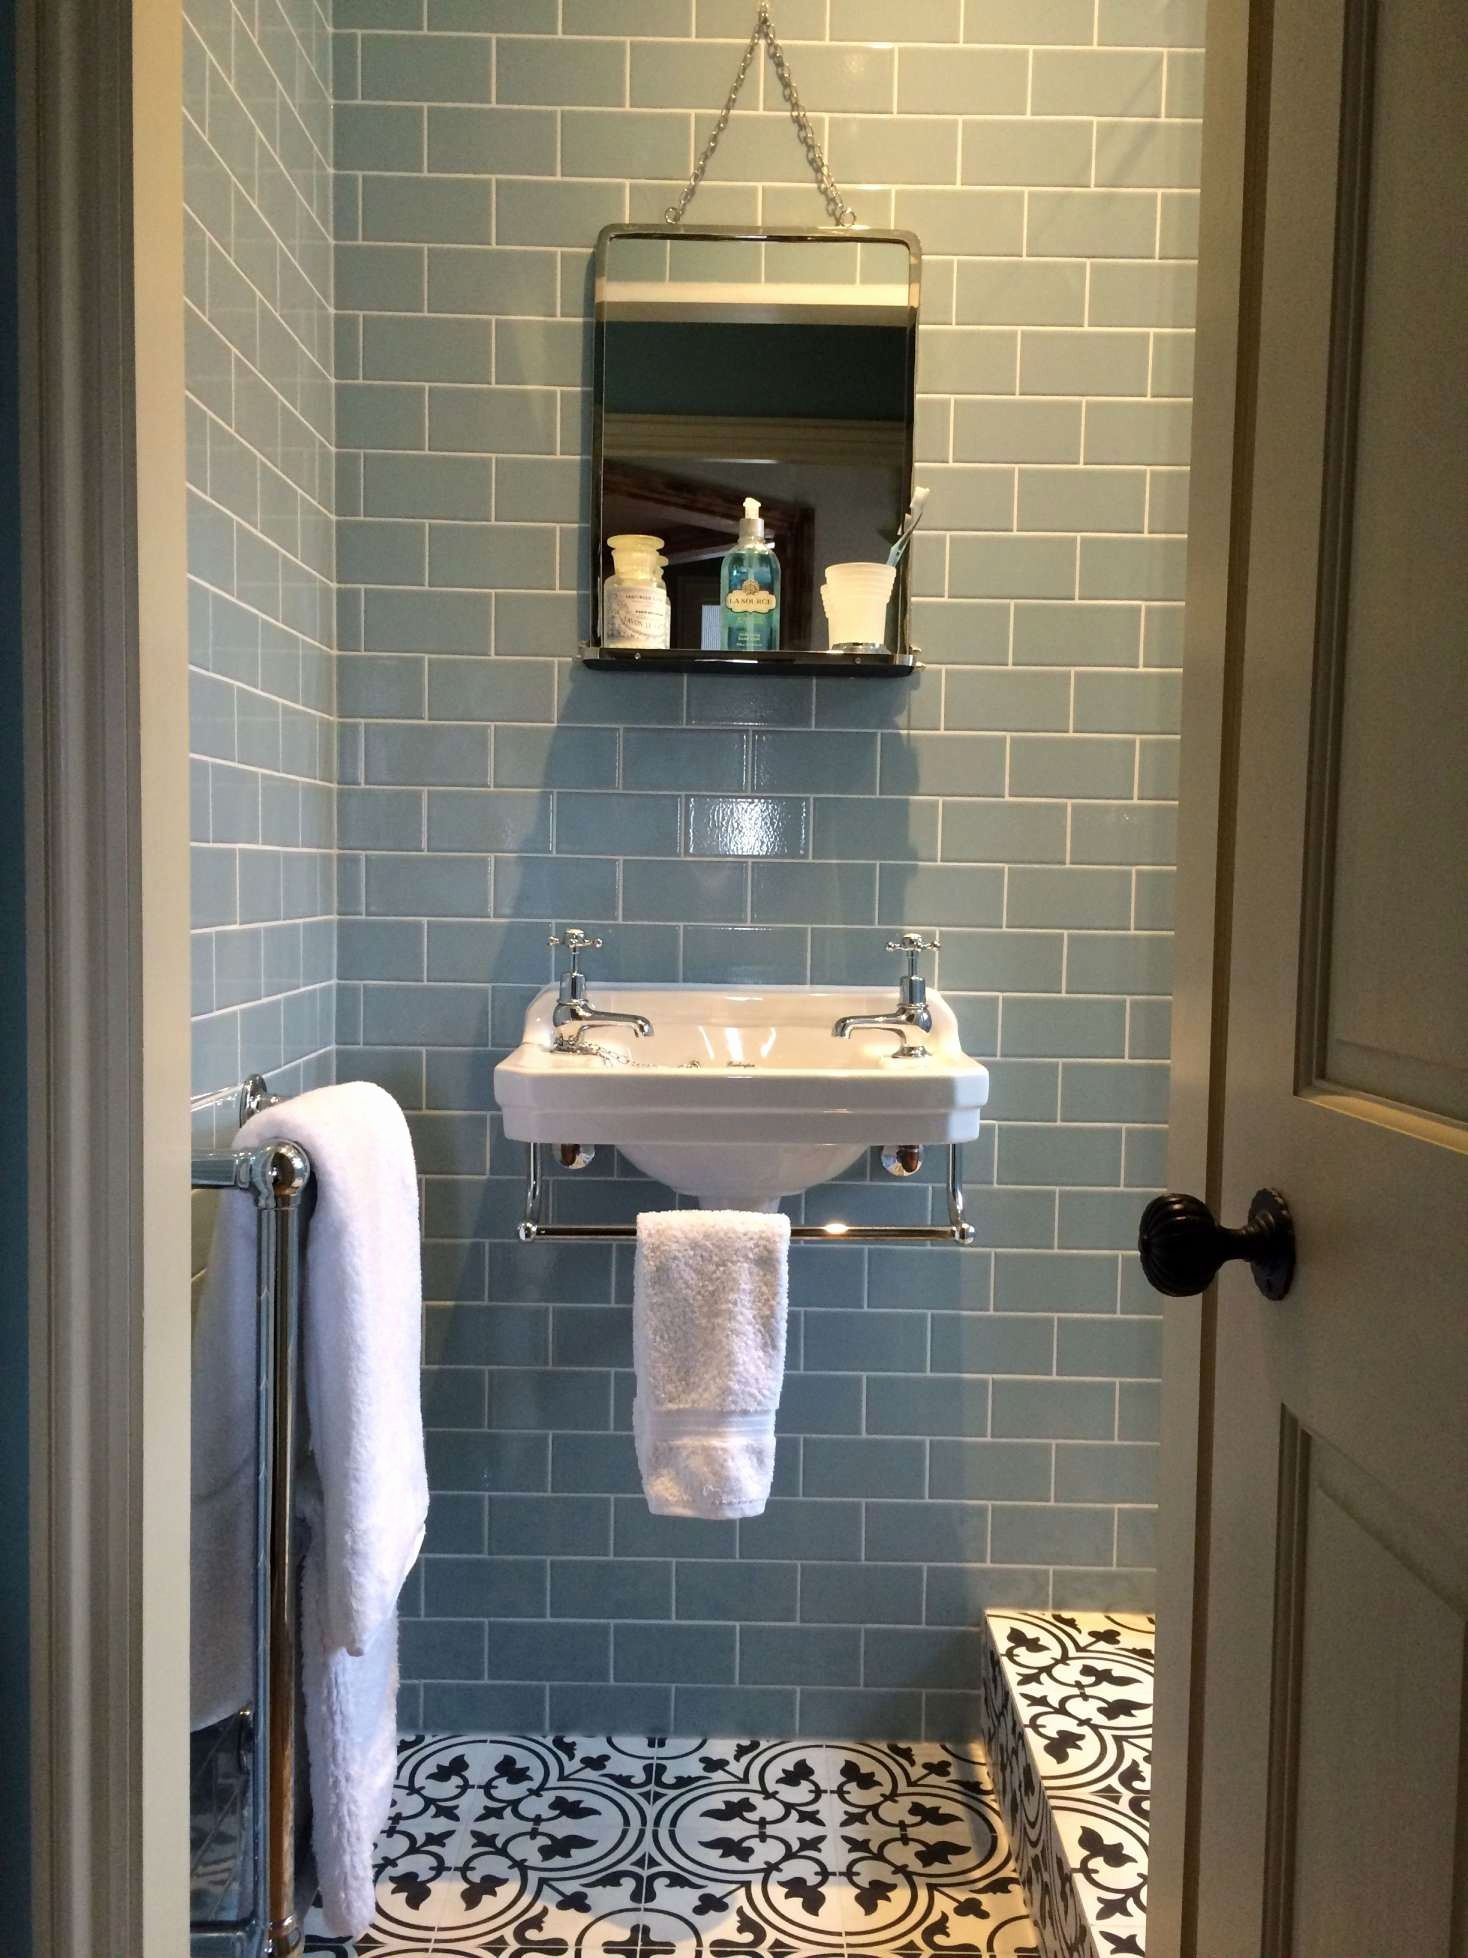 23 Doorless Shower Ideas Ceramic Tile Wet Room Numerous Spray Tile Bathroom Amazing Bathrooms Bathroom Design